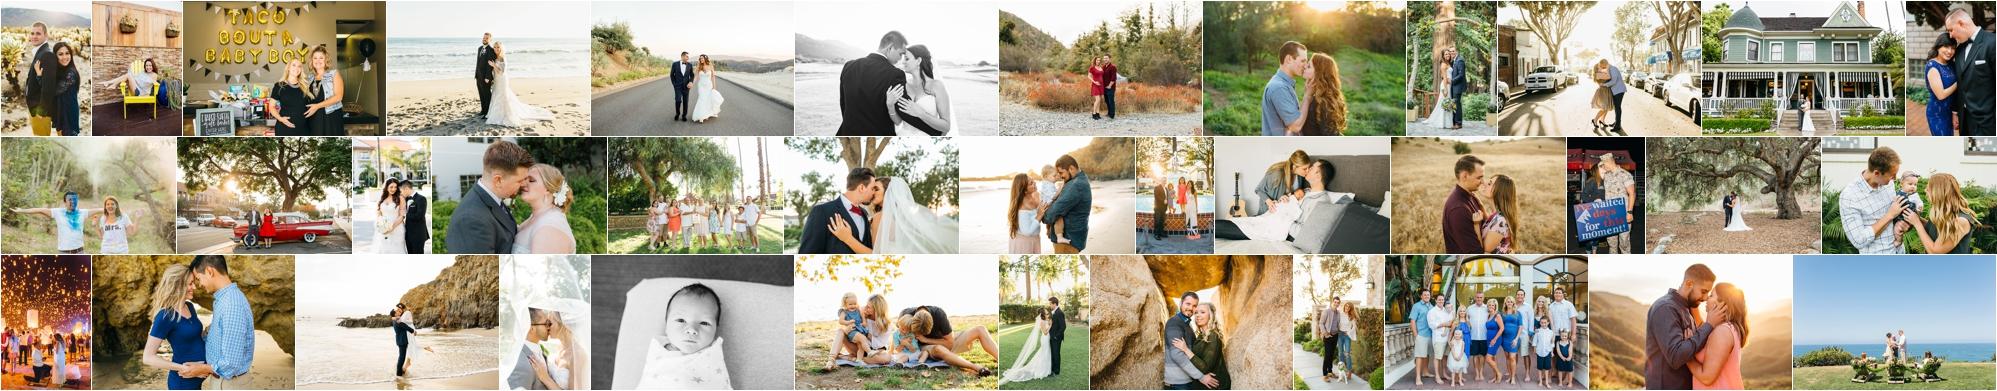 Southern California Wedding + Portrait Photographer - http://brittneyhannonphotography.com